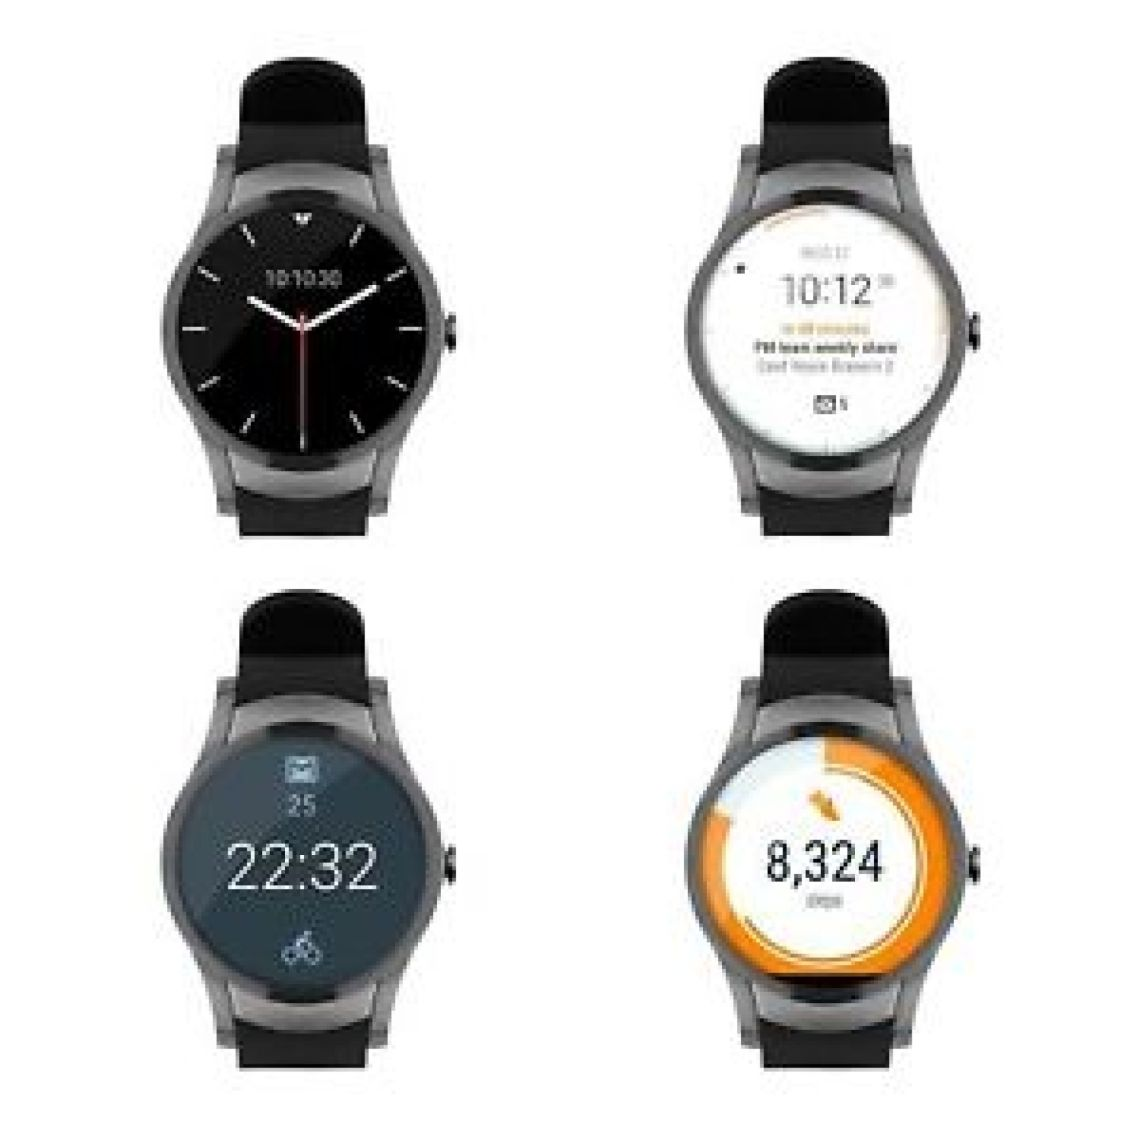 Wear24 Quanta Smartwatch by Verizon 42mm WiFi + Bluetooth Android Wear 2.0   eBay